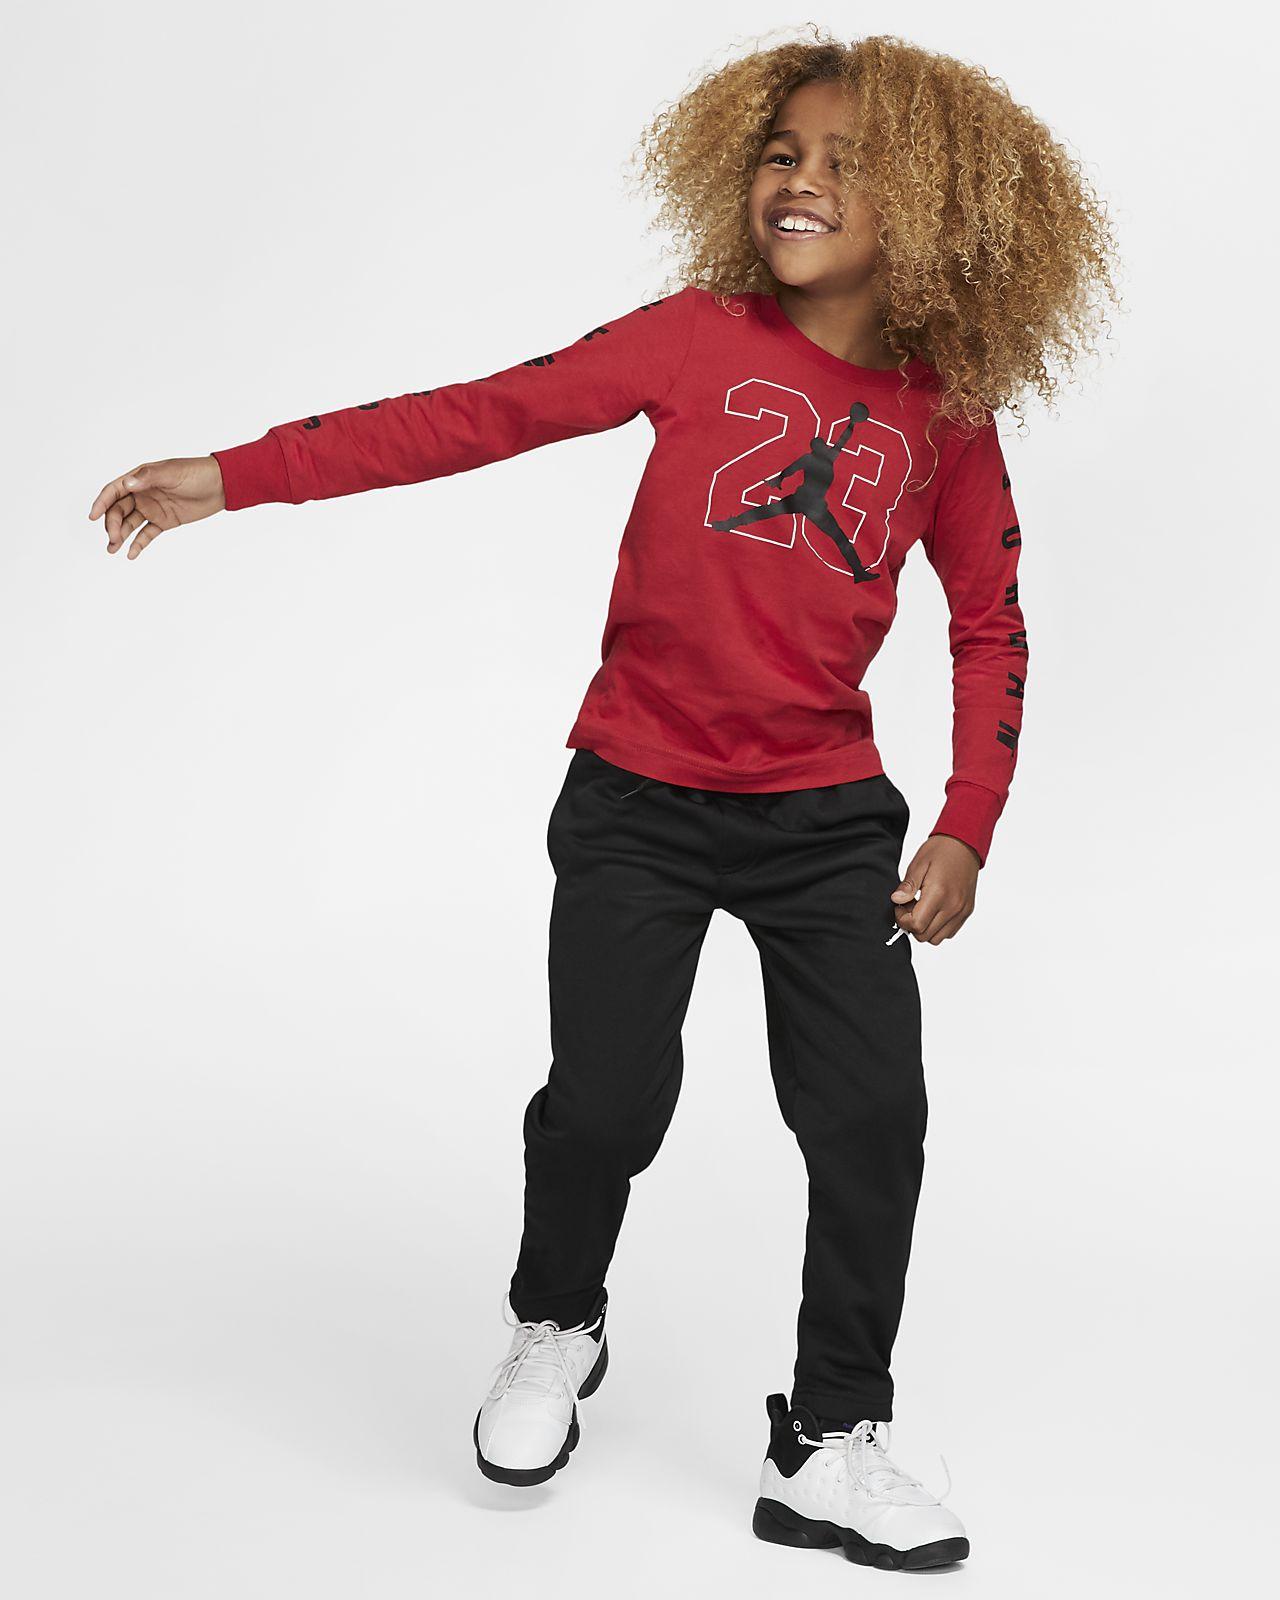 ae38999f Jordan Jumpman 23 Little Kids' Long-Sleeve Graphic T-Shirt. Nike.com